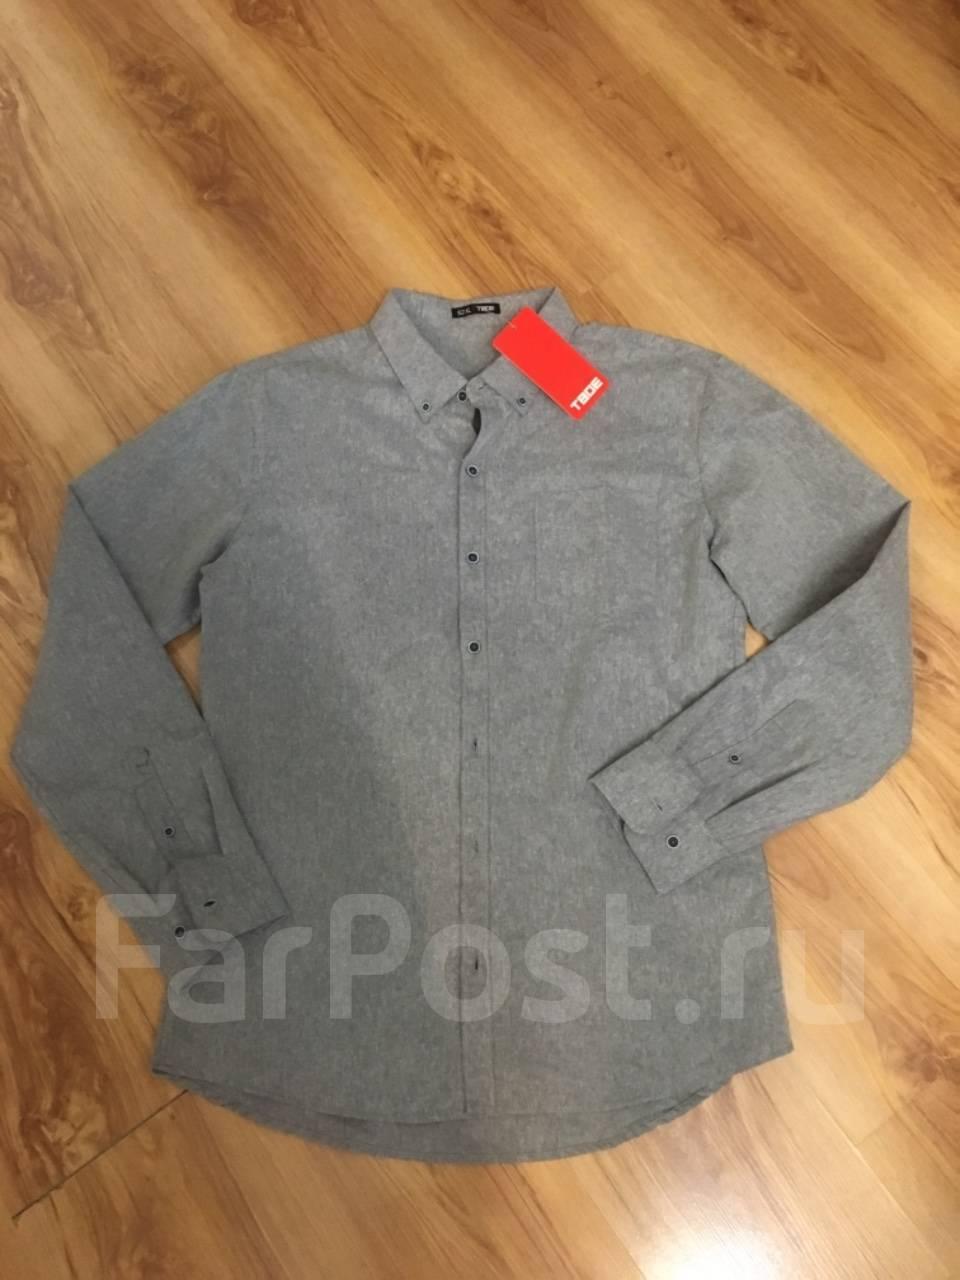 7e19b595200 Рубашки и сорочки мужские Размер  52 размера - купить во Владивостоке.  Цены! Фото.